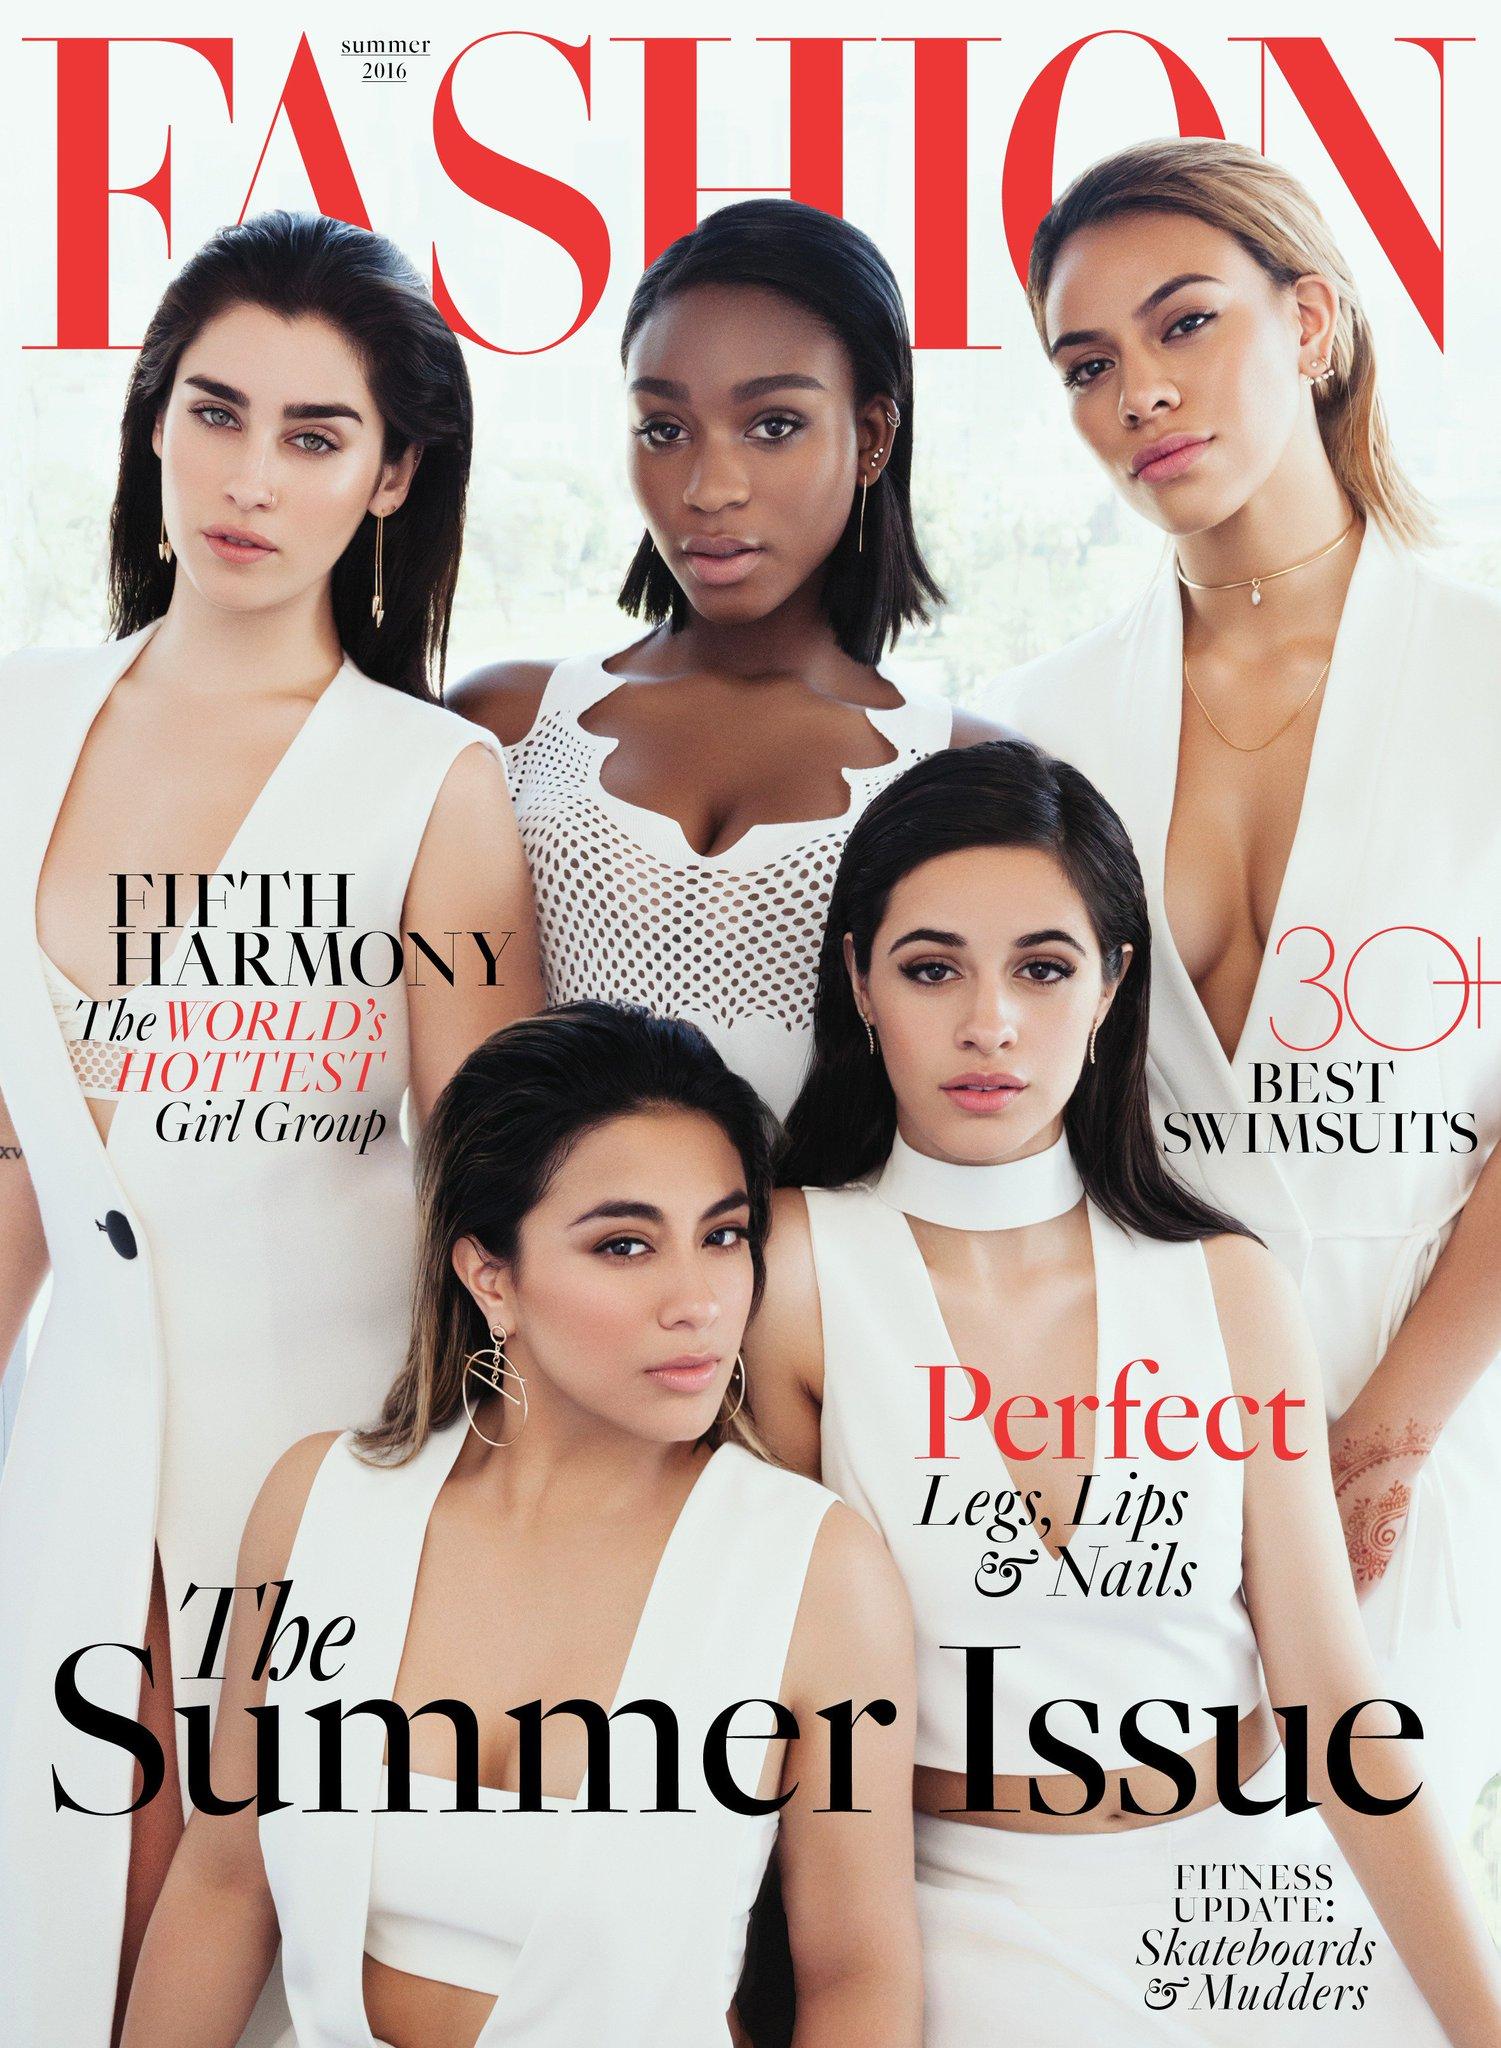 Fifth Harmony - Página 2 CiHvk8VUUAA-LRO